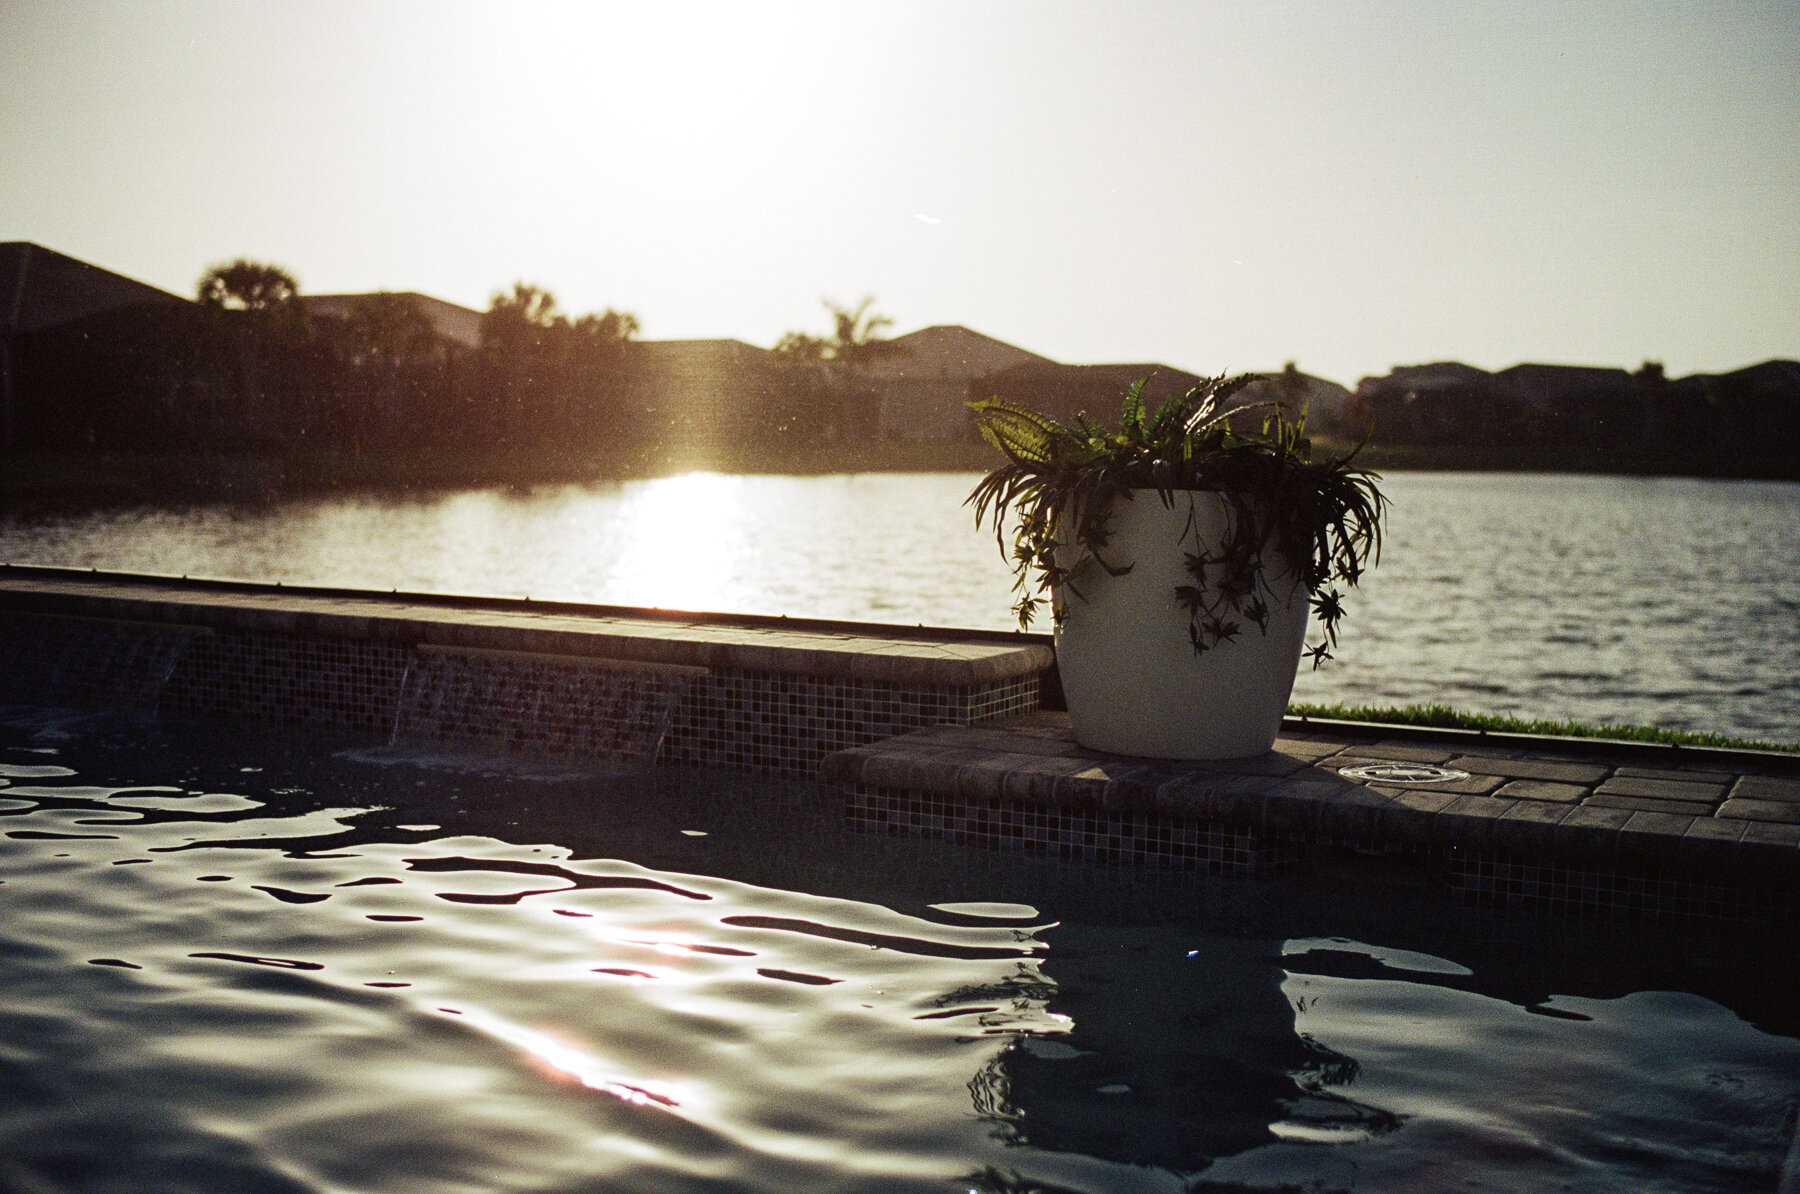 Leica-M6-Pool-Chloe-35.jpg